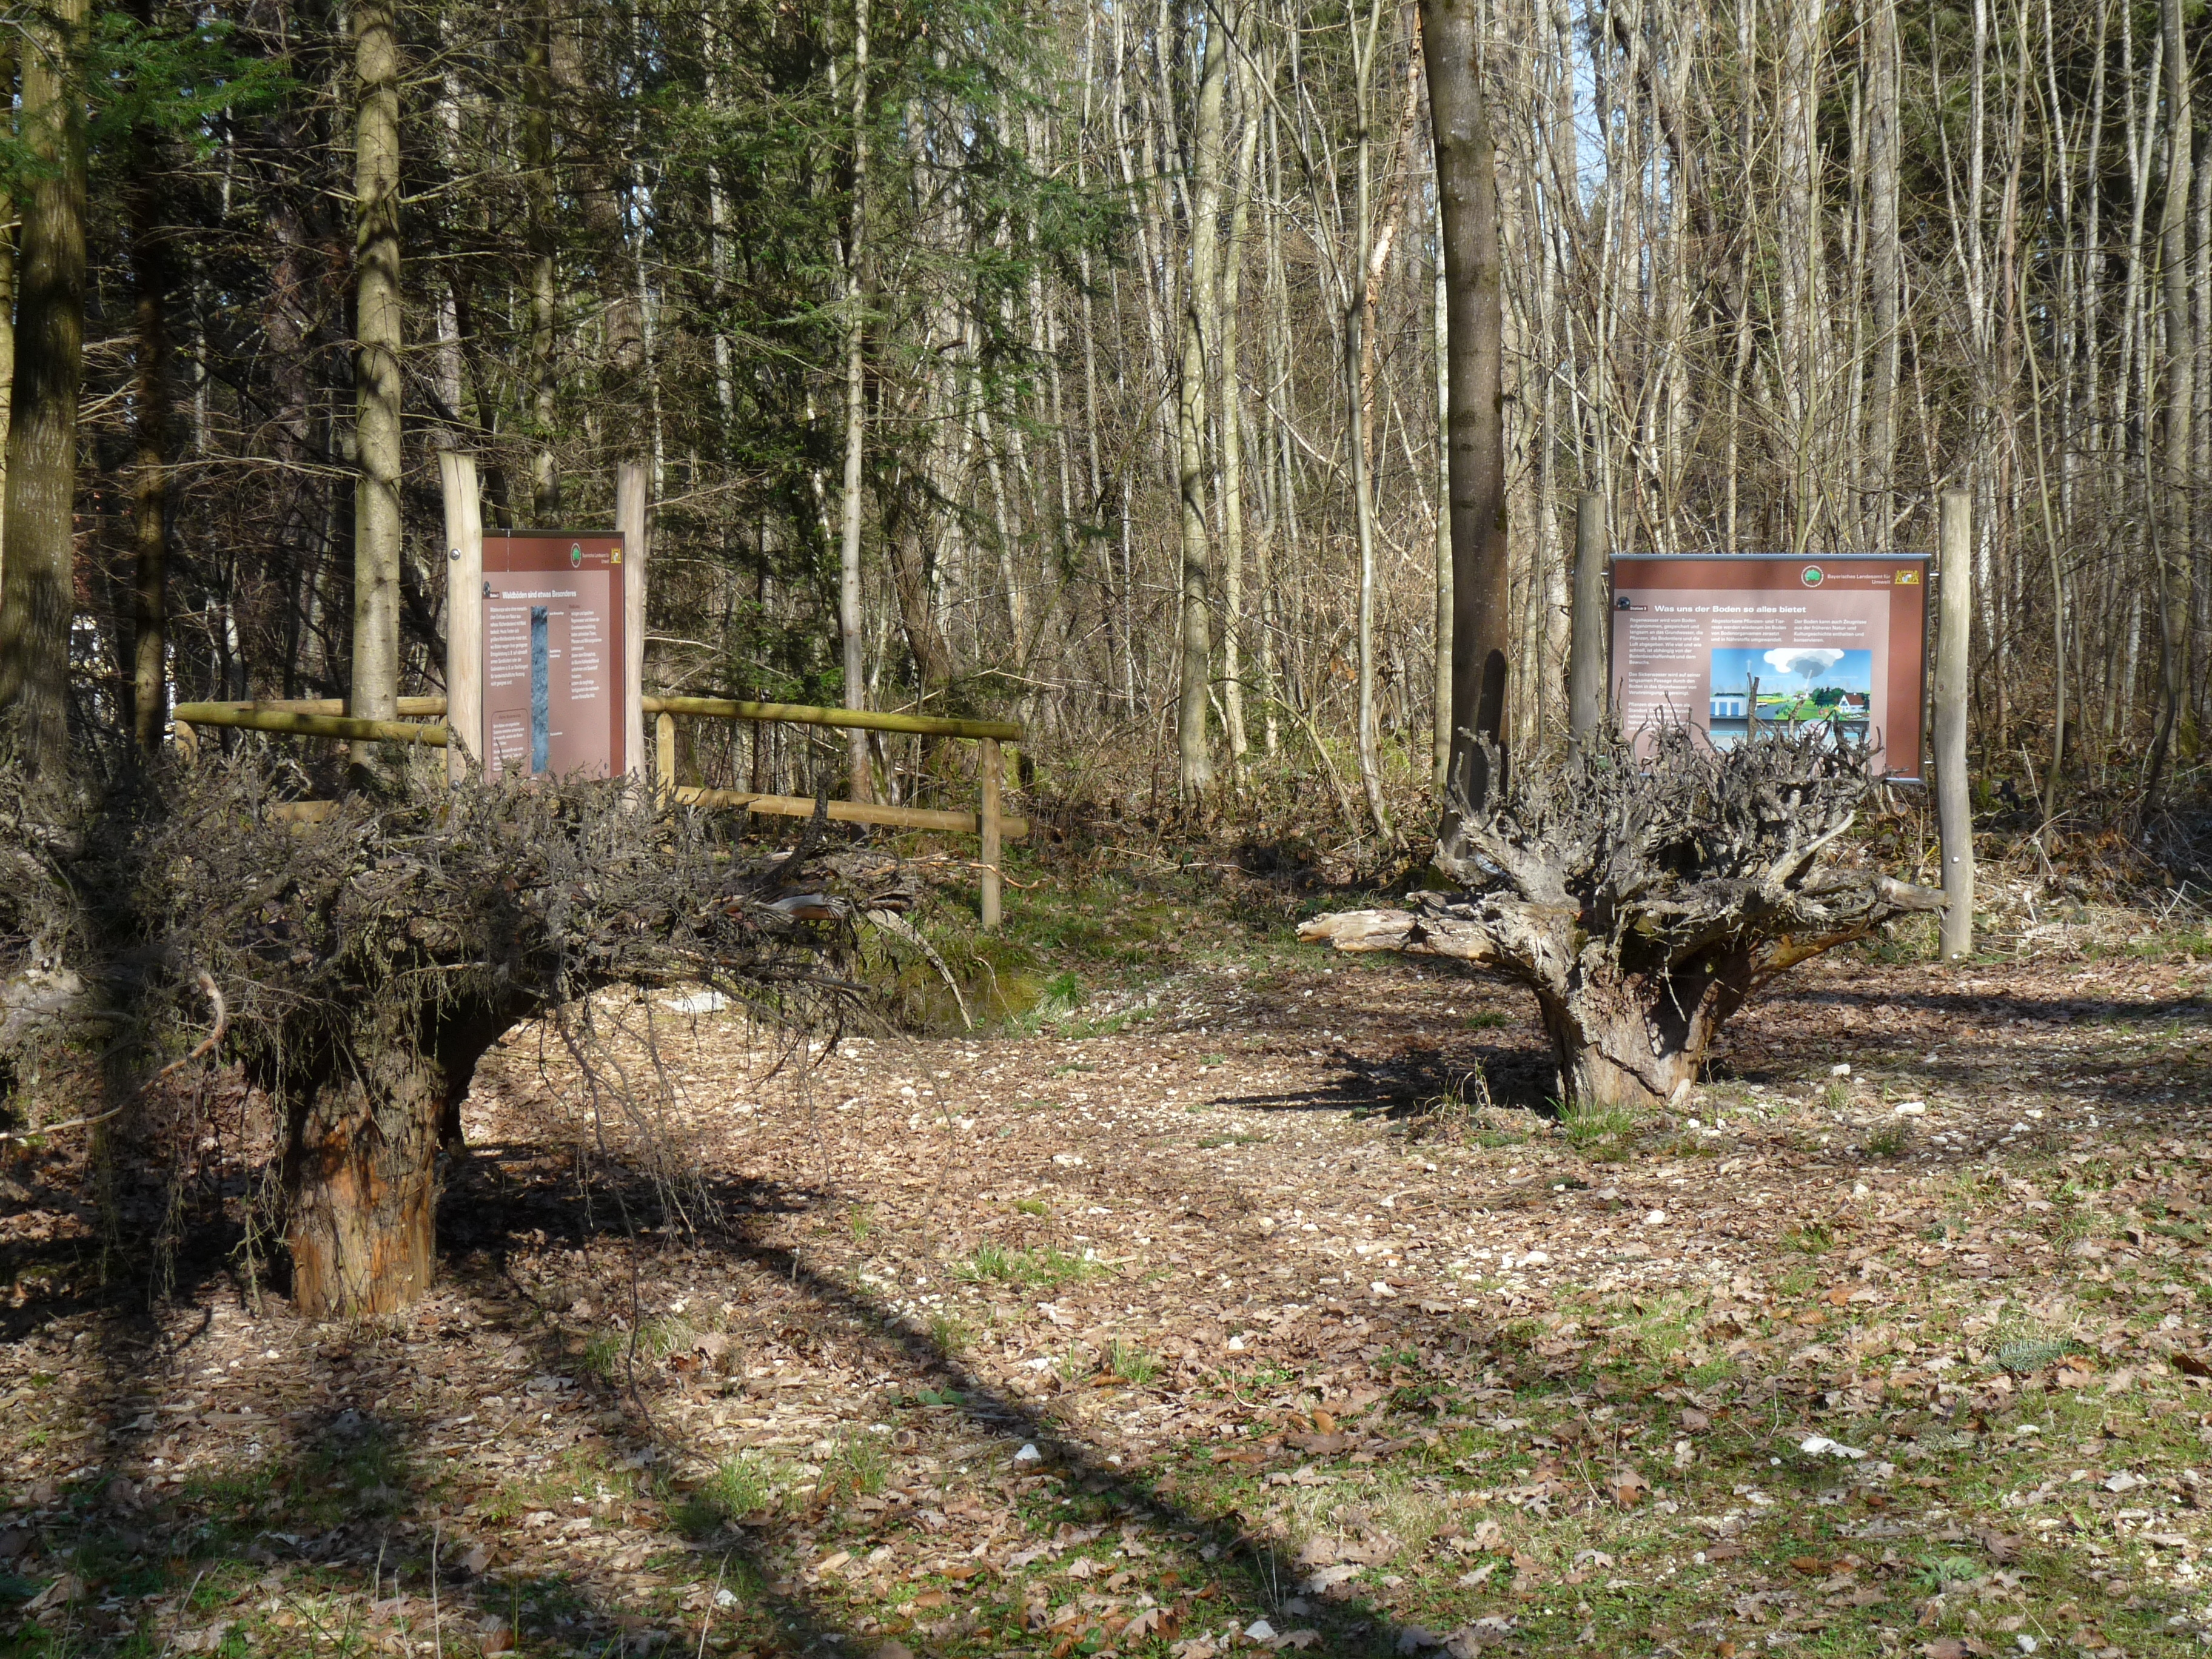 Bodenerlebnispfad Roggenburg